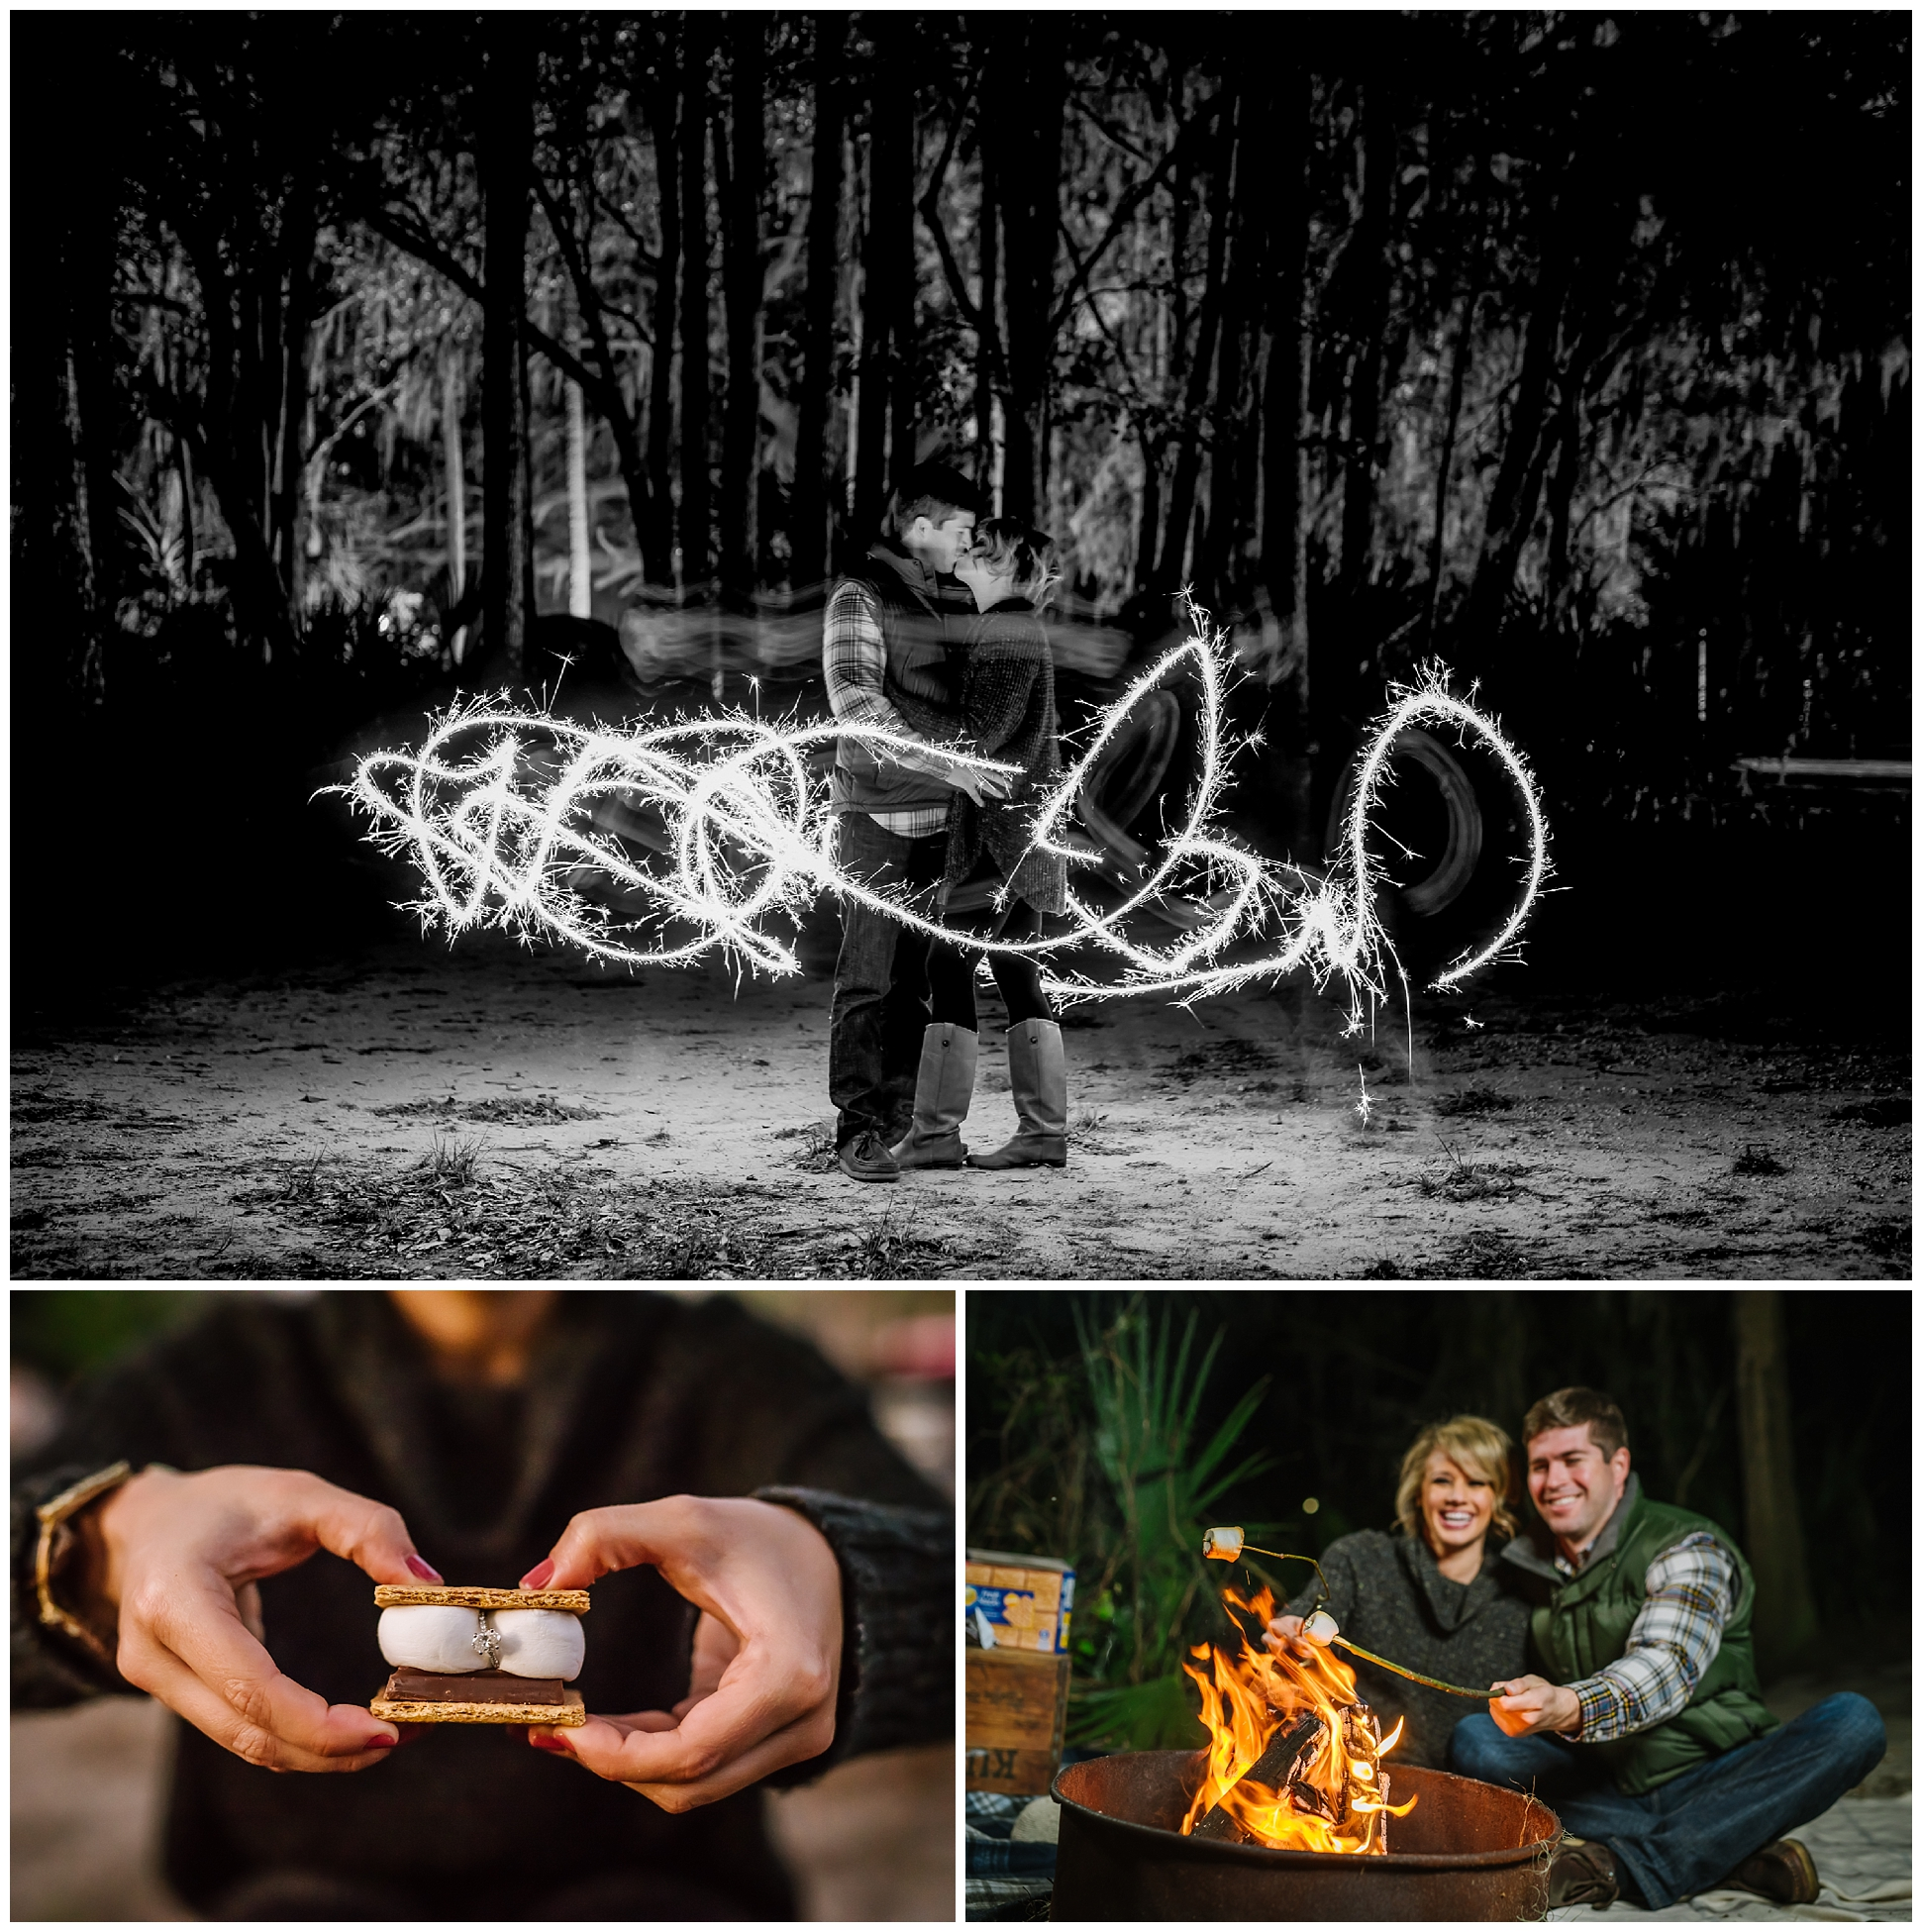 Ashlee-hamon-photography-year-in-review-2016-travel-wanderlust-vsco-adventure-wedding_0082.jpg